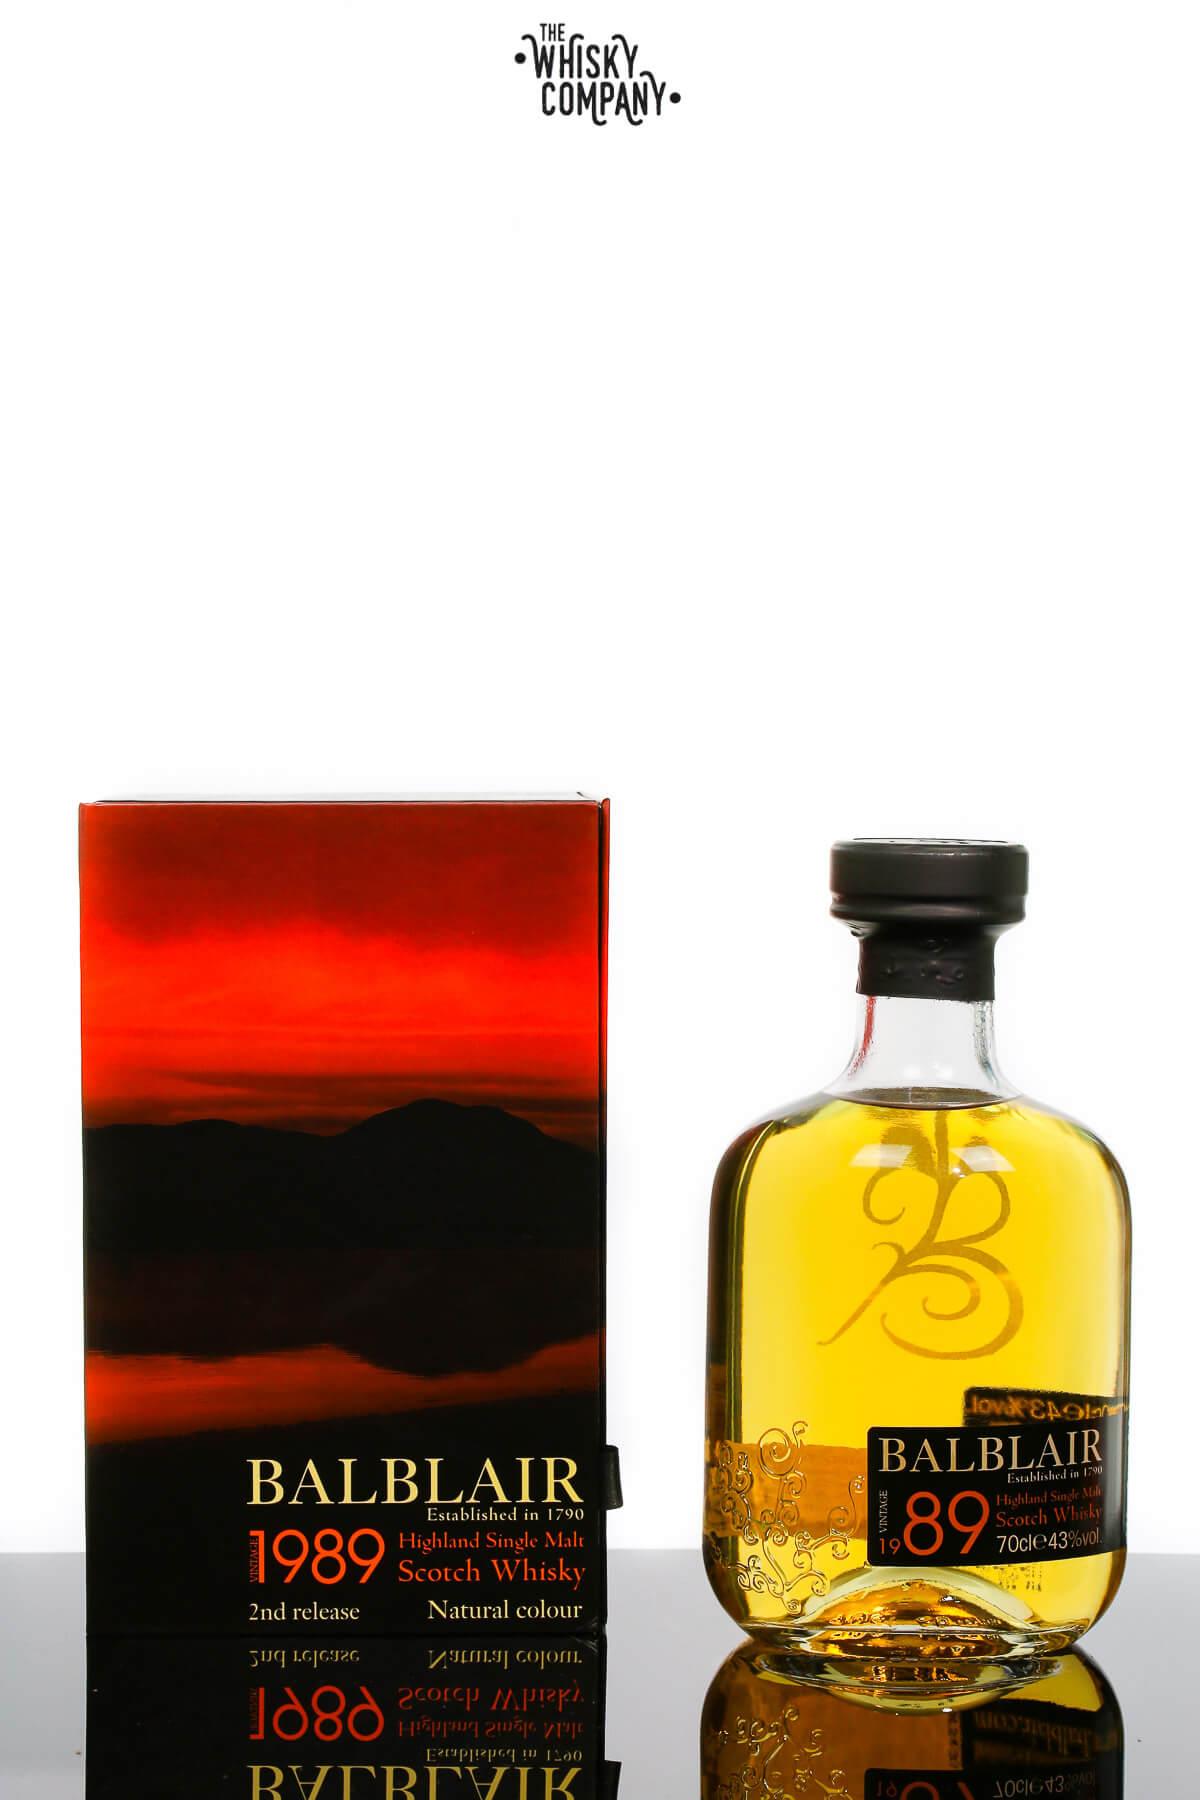 Balblair 1989 Highland Single Malt Scotch Whisky